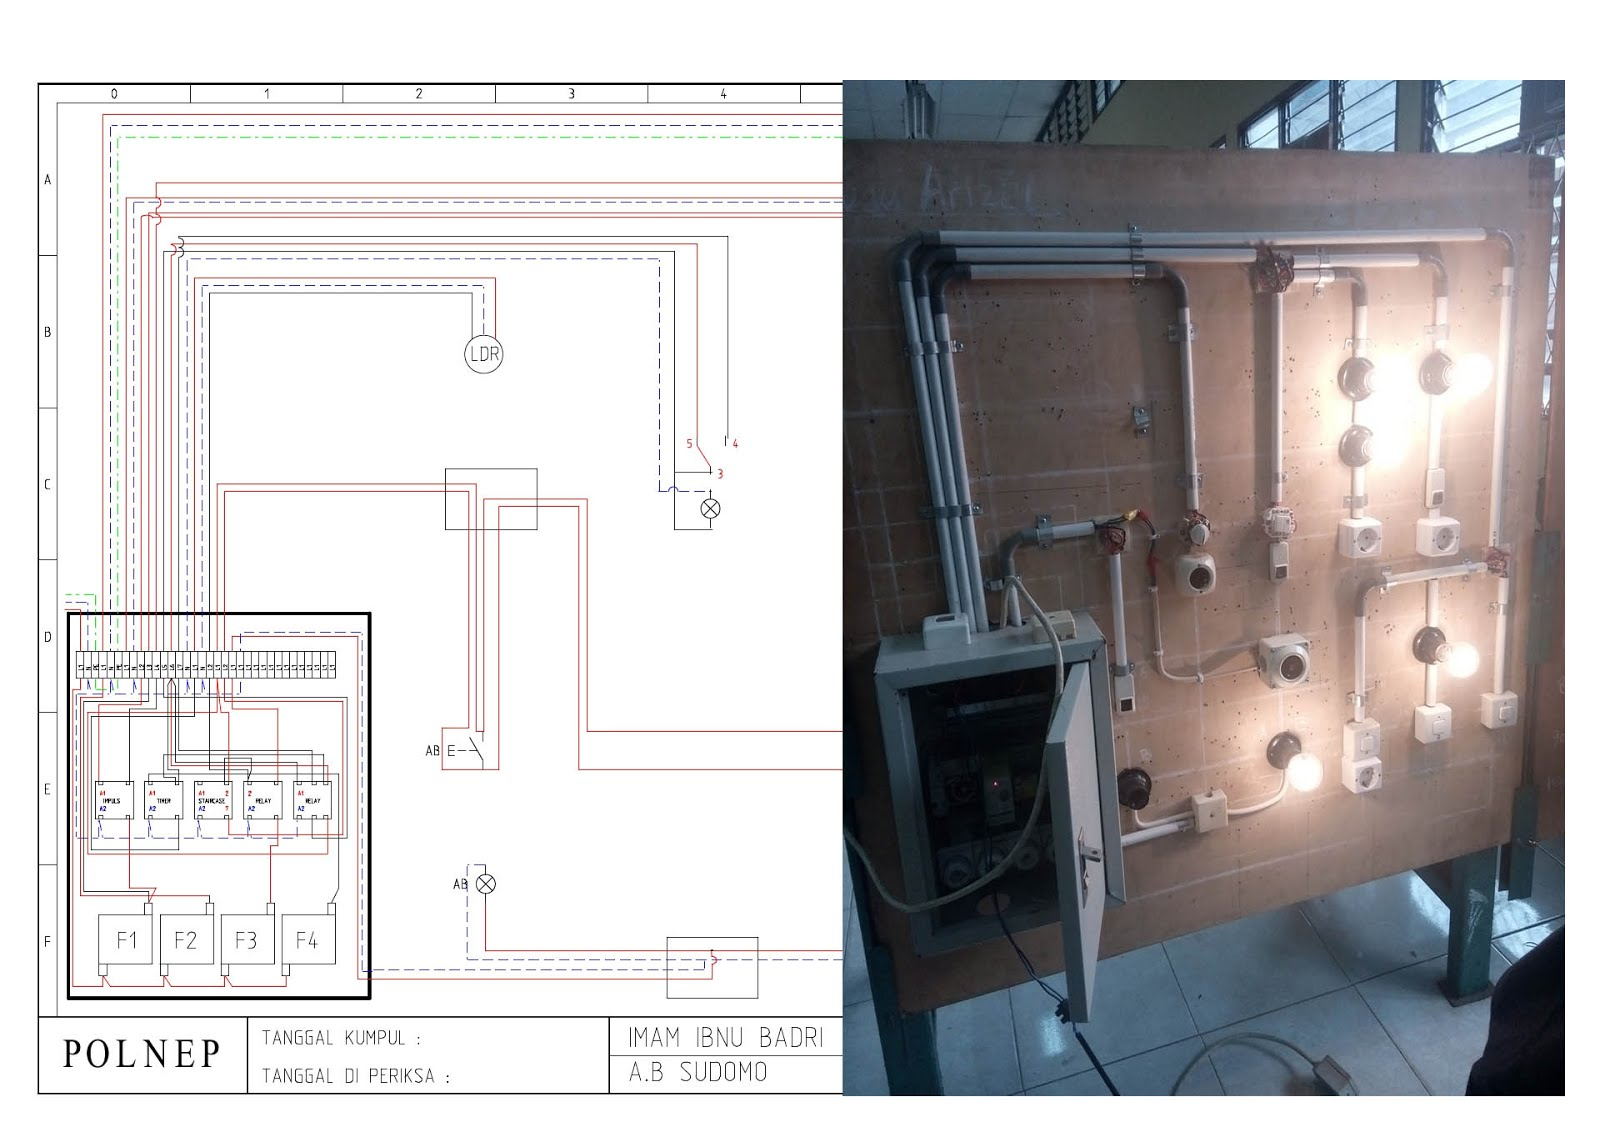 Instalasi Rumah Tinggal Proyek A.B Sudomo (Bengkel)